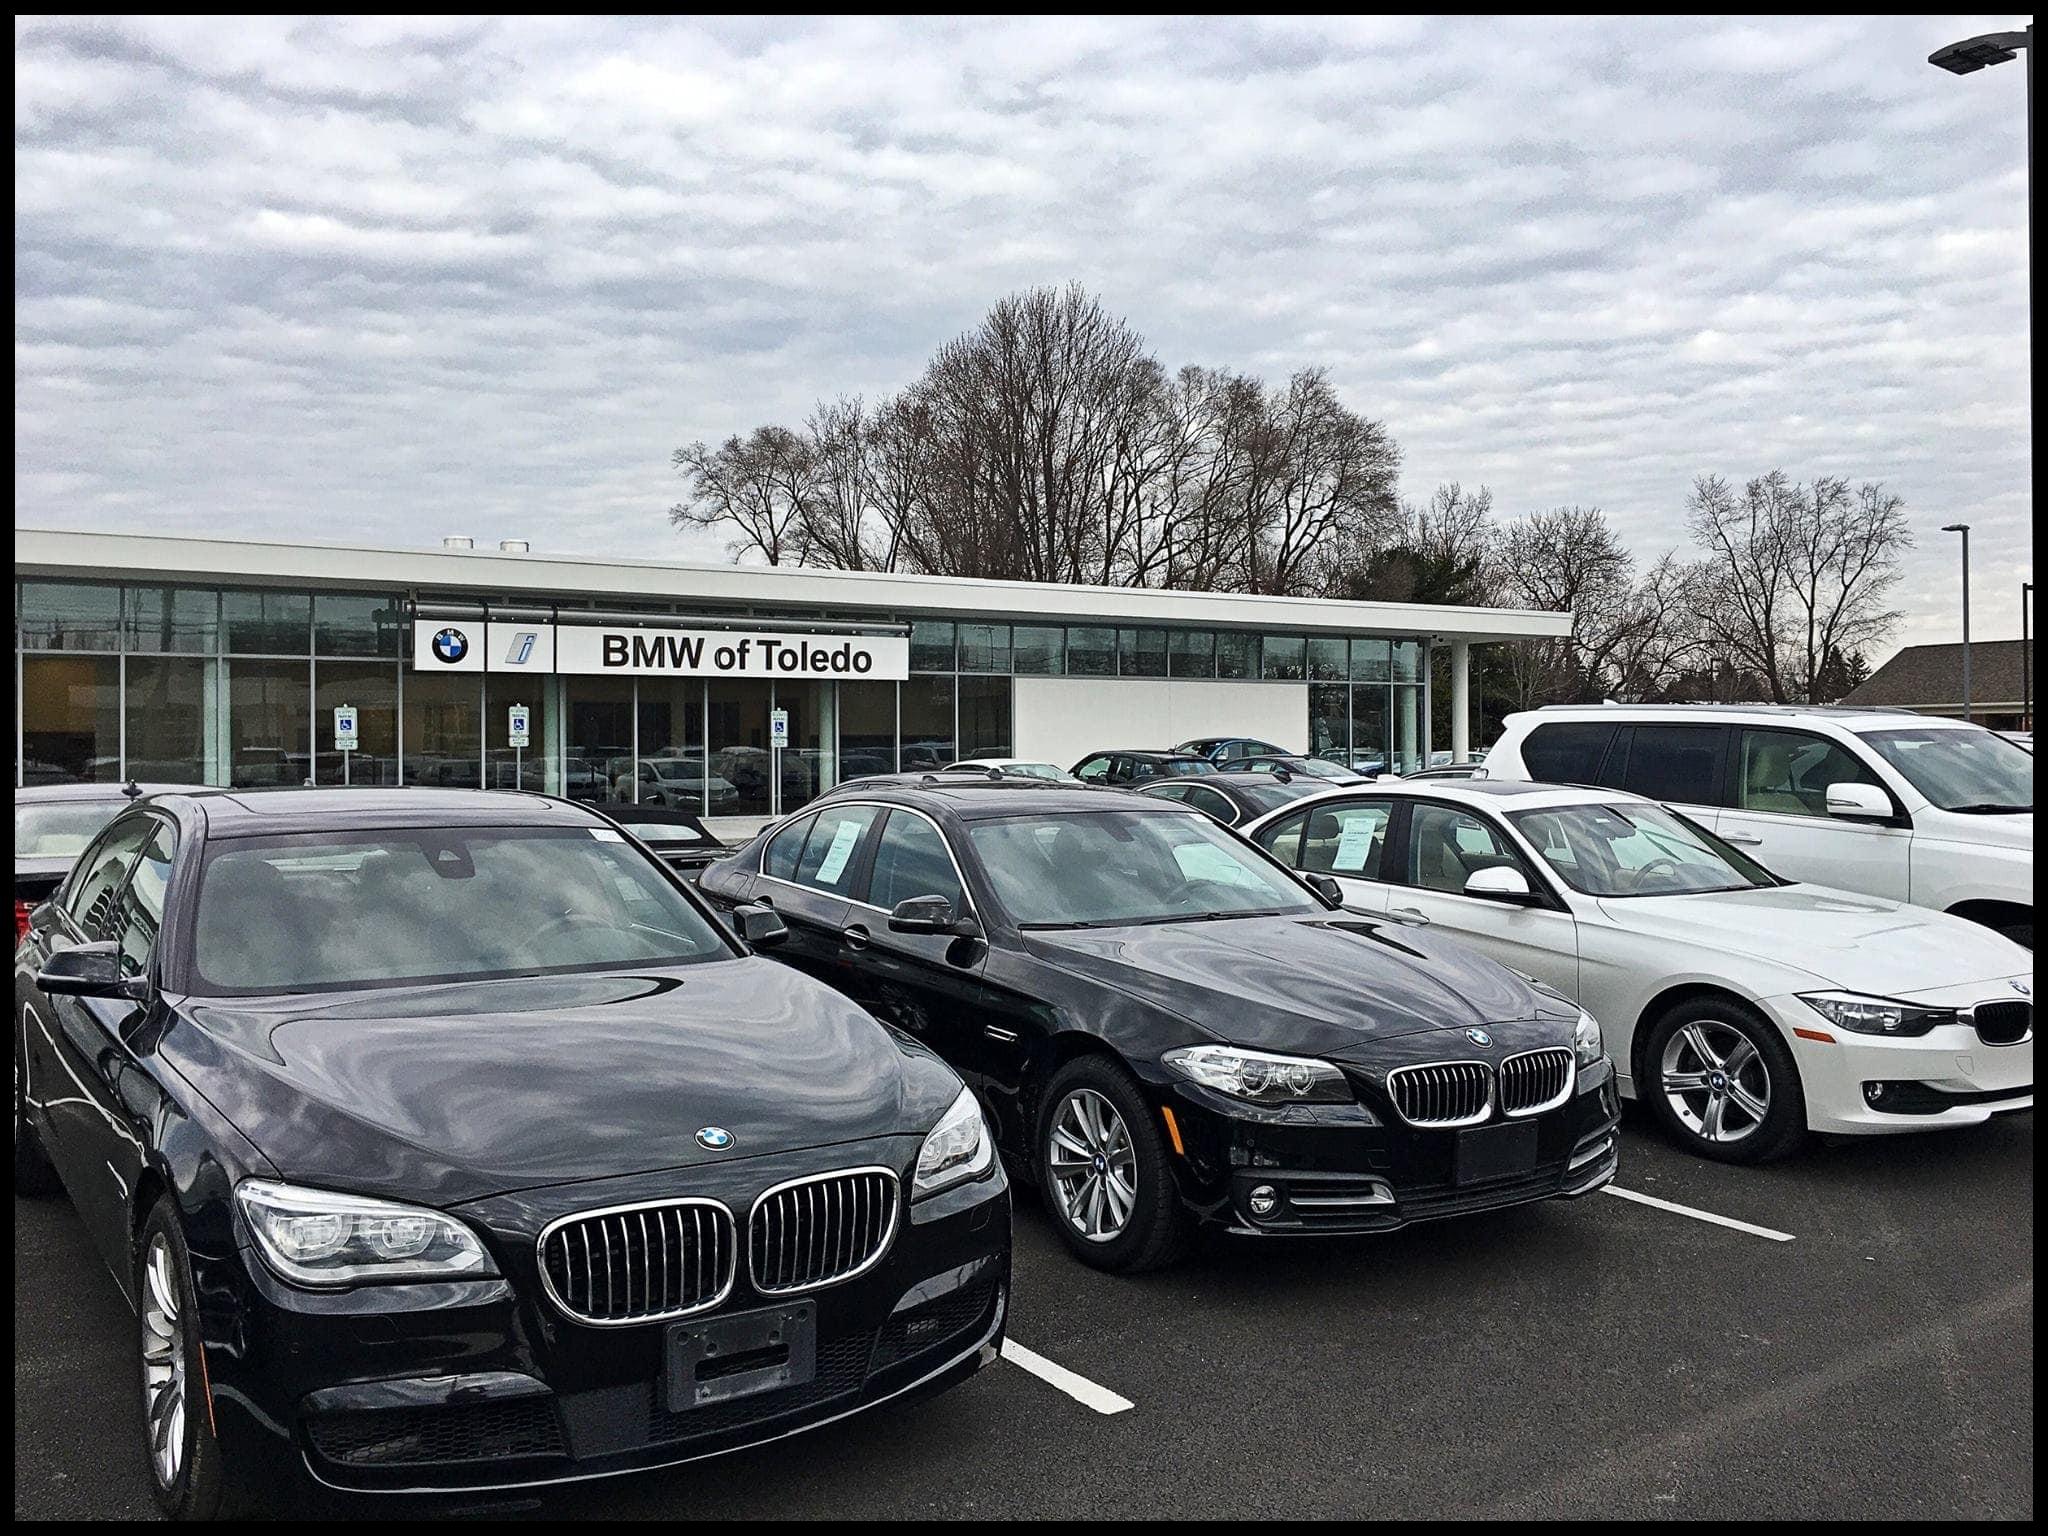 About BMW Toledo